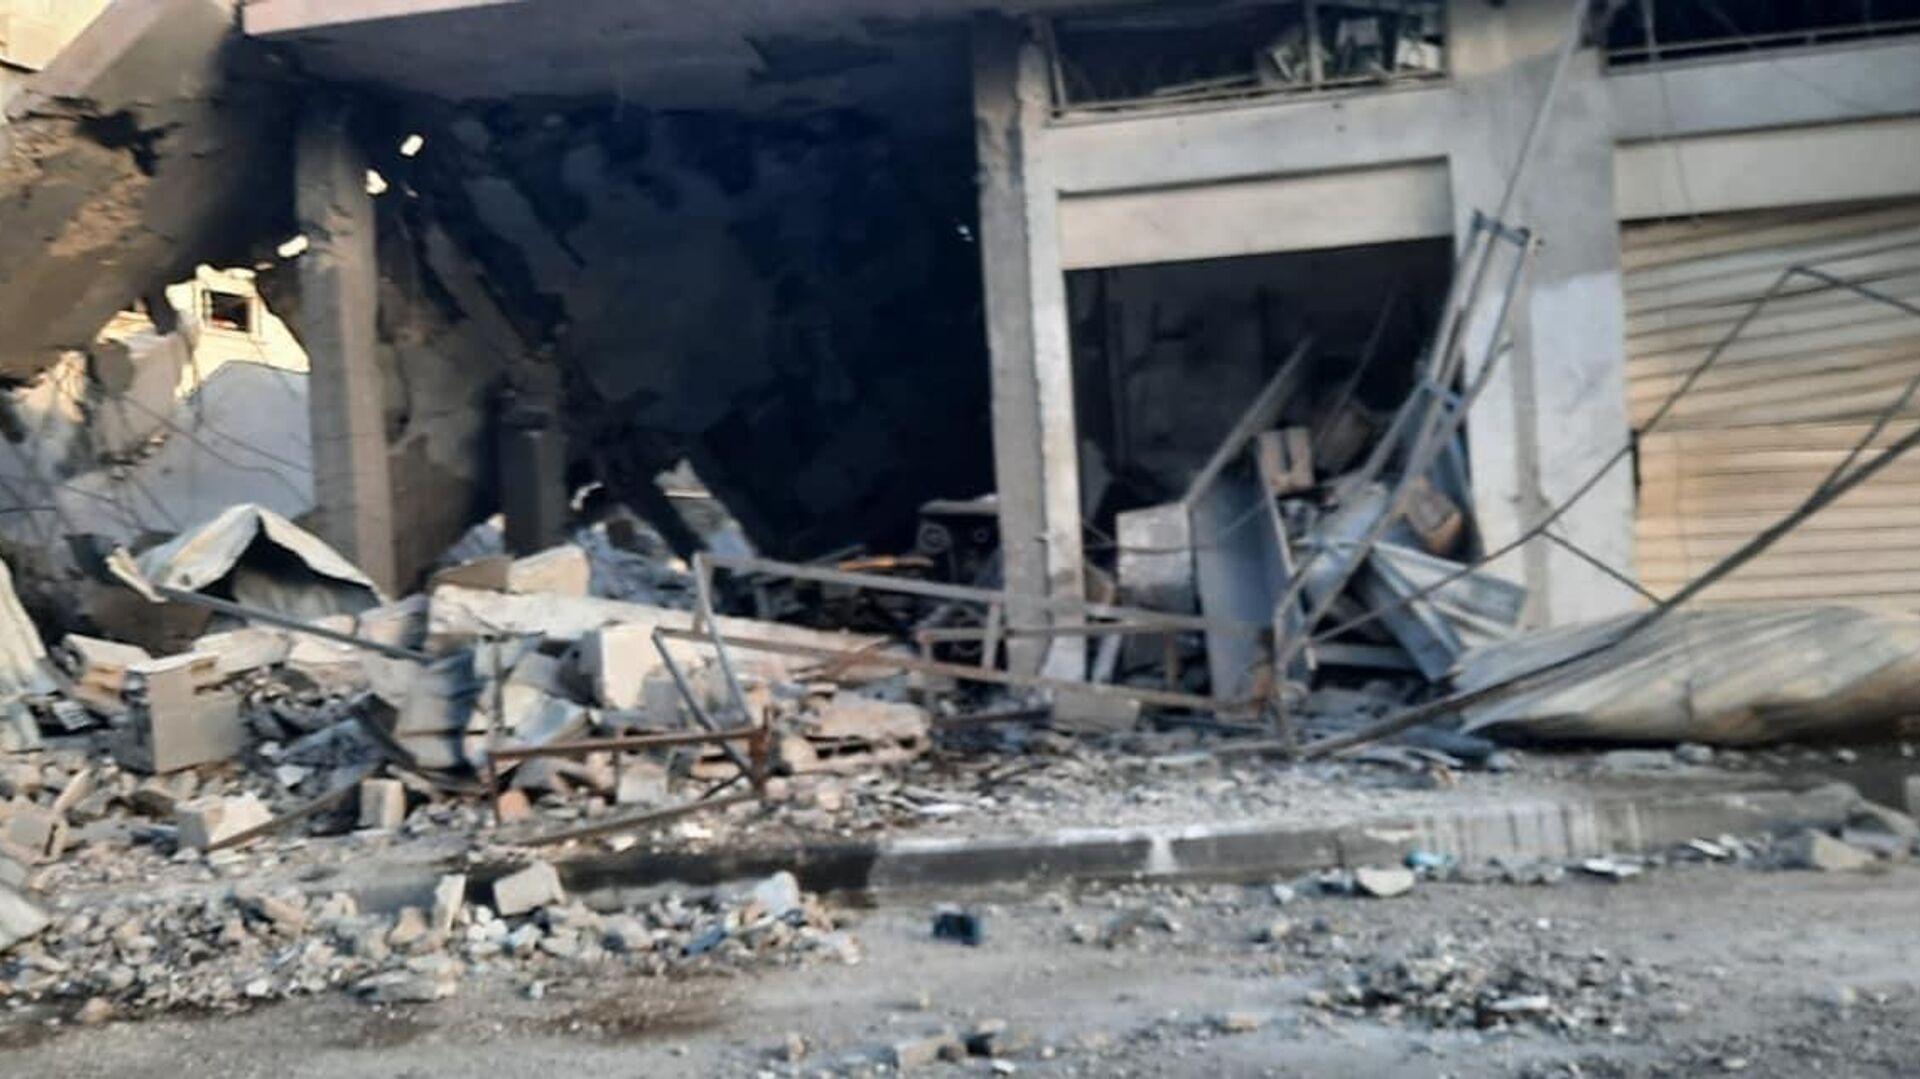 Una situazione drammatica a Gaza dopo una nuova escalation di violenza tra israeliani e palestinesi - Sputnik Italia, 1920, 13.09.2021